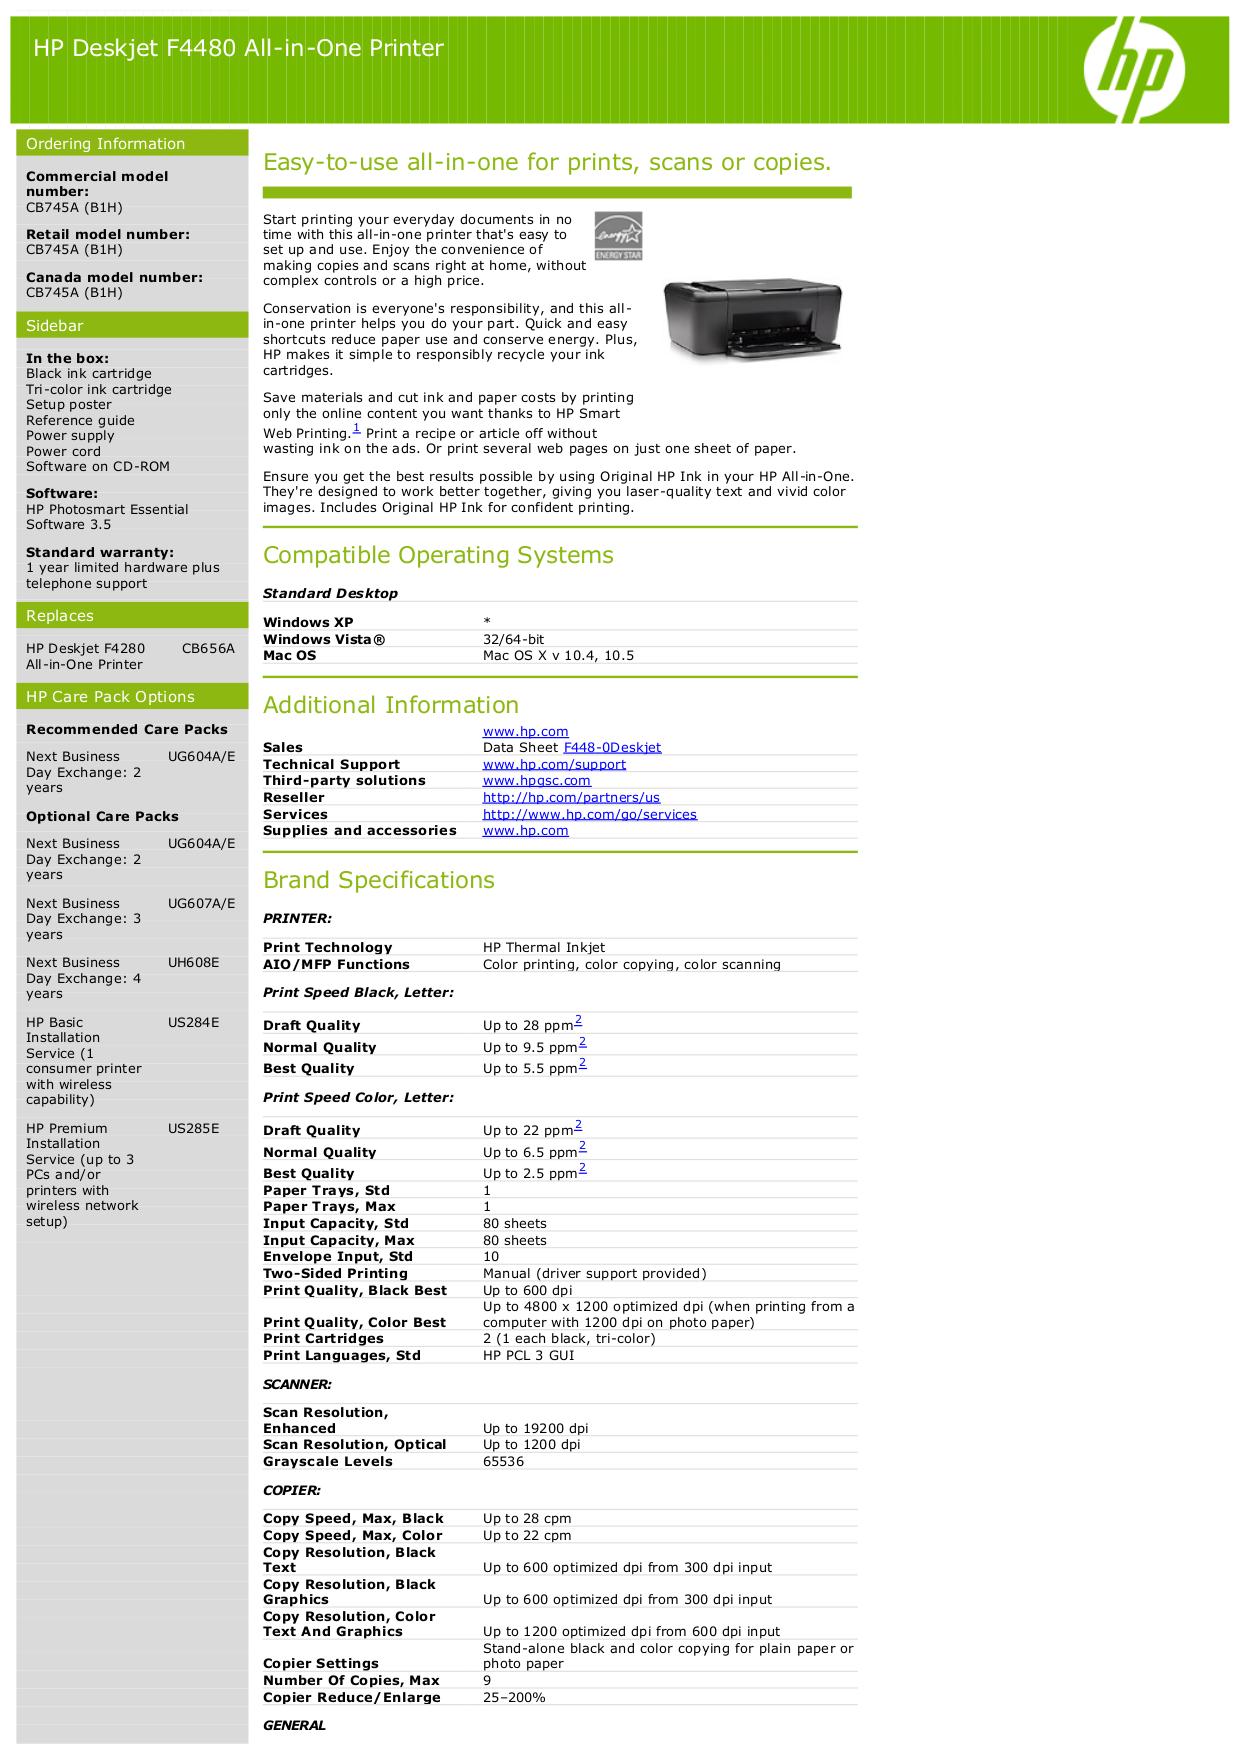 download free pdf for hp deskjet f4480 multifunction printer manual rh umlib com hp deskjet f4400 user manual hp deskjet f4480 instructions